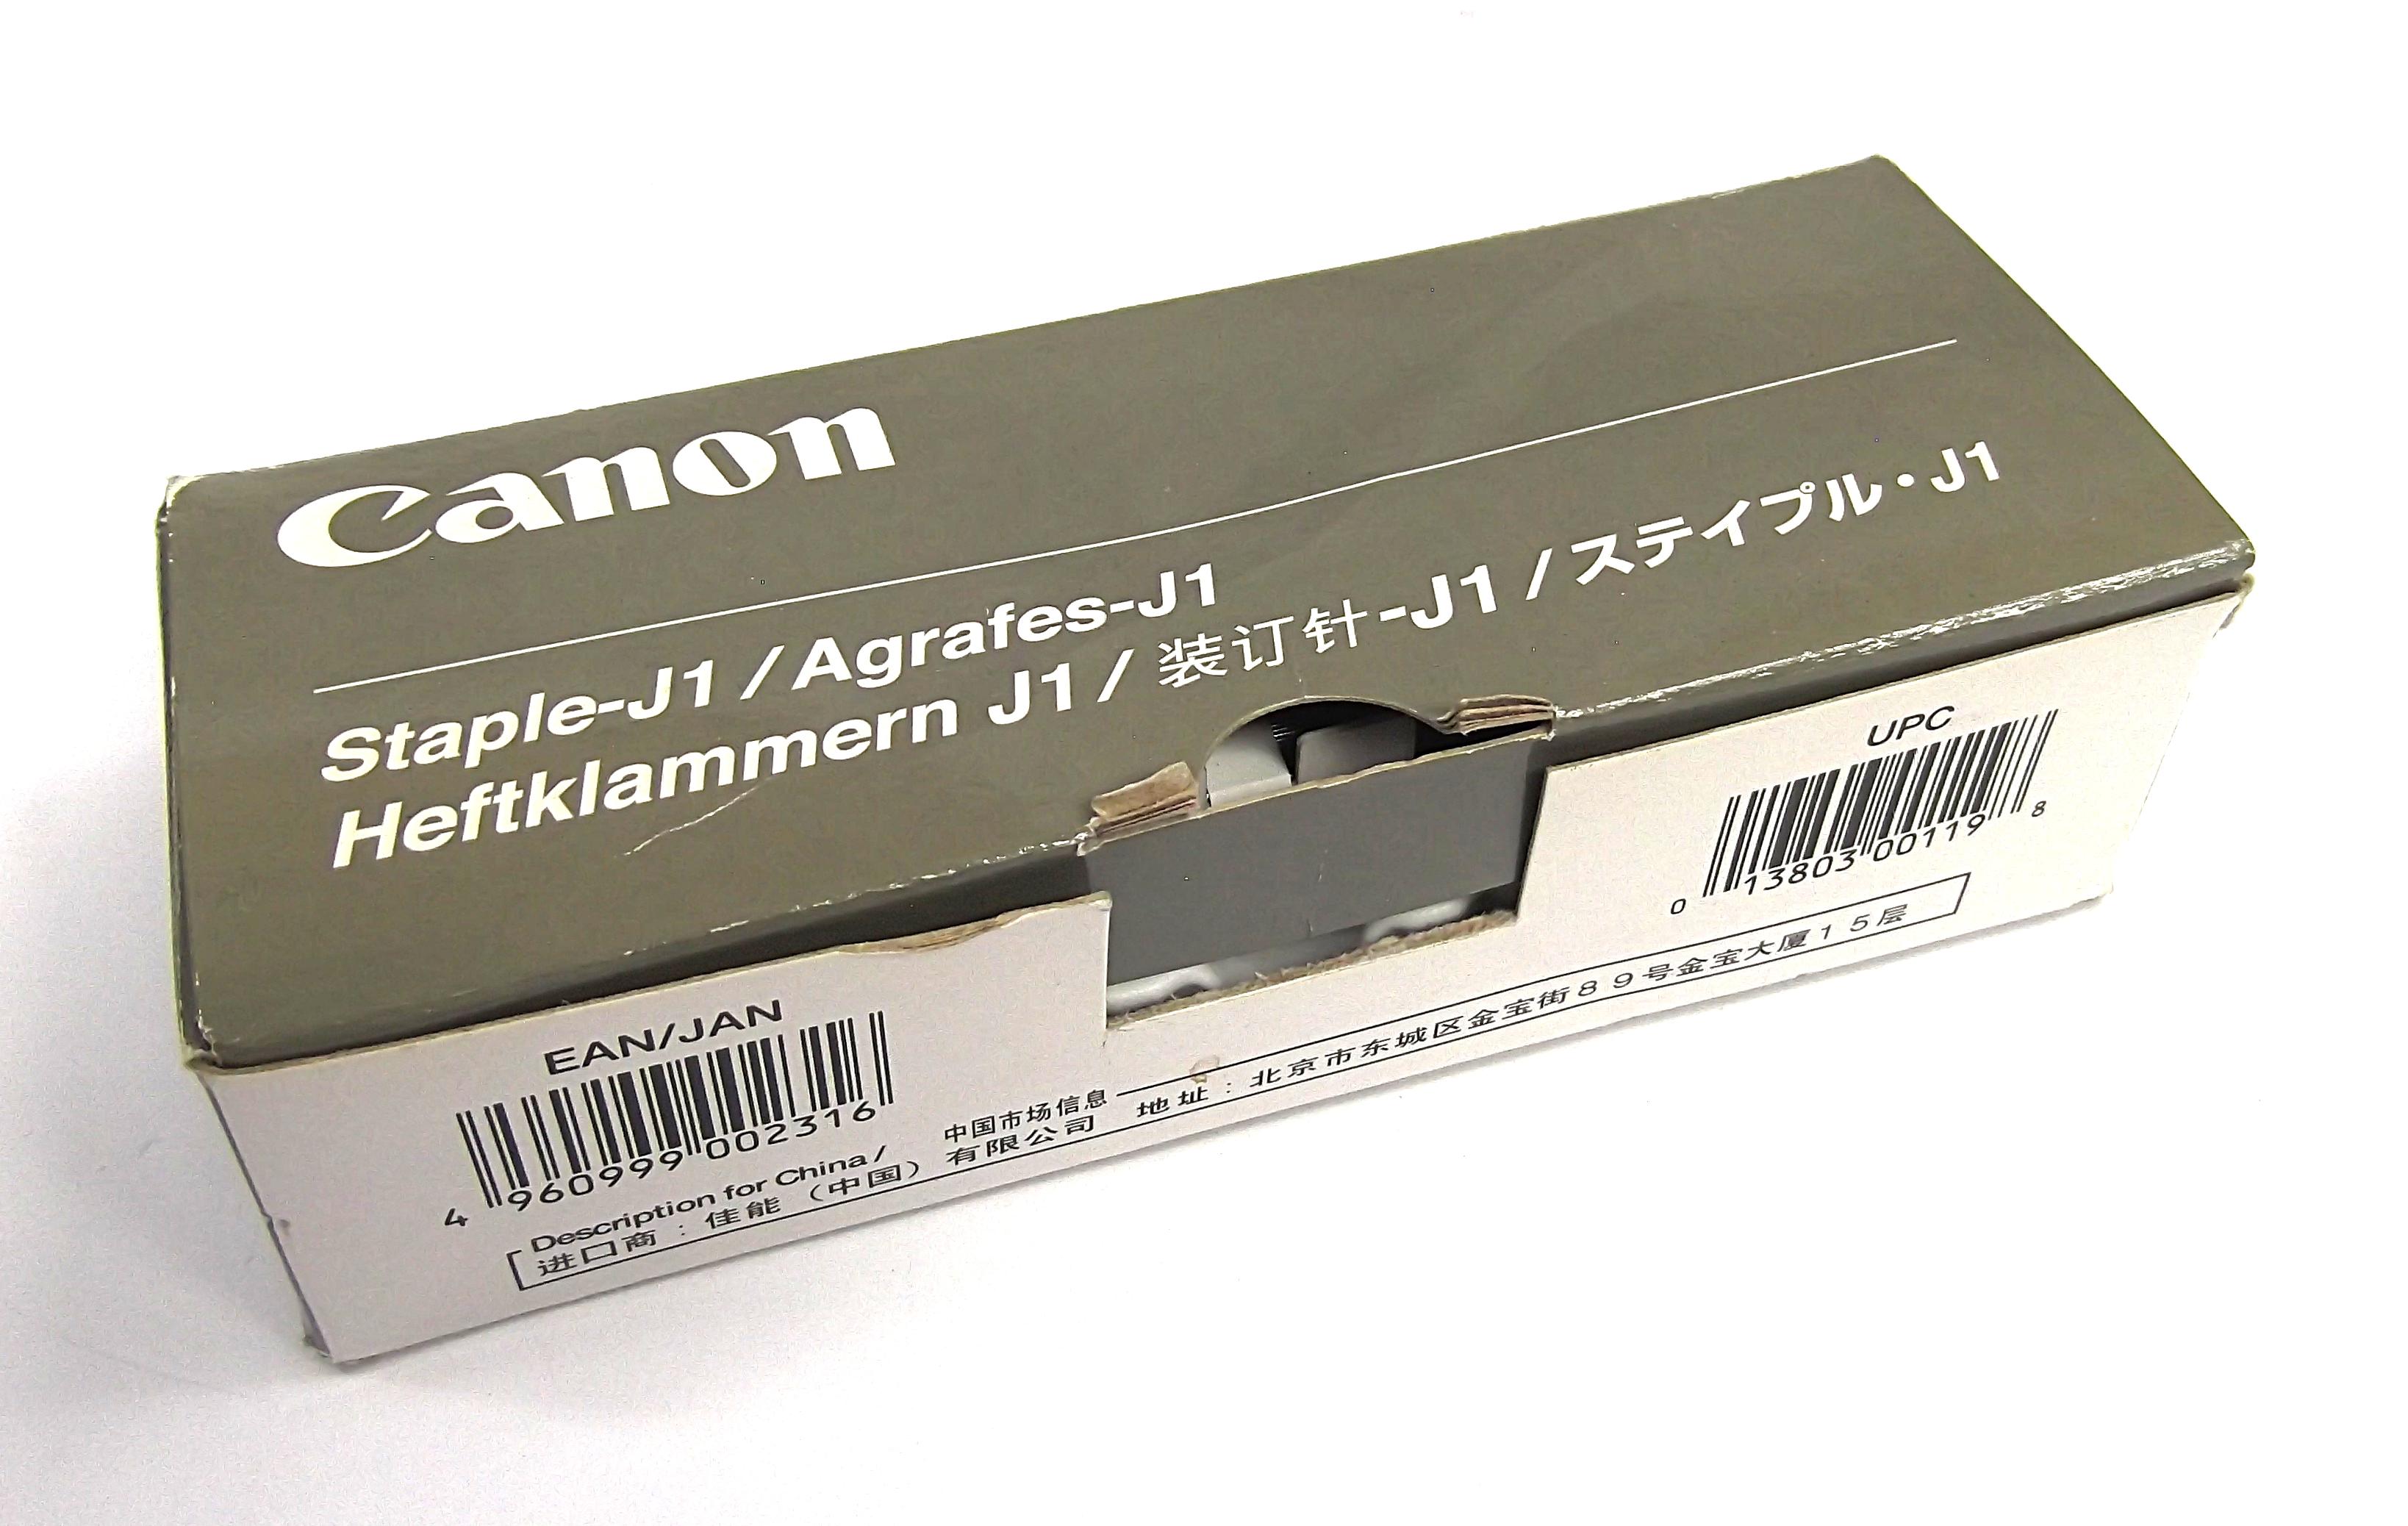 Canon 6707A001 Staple-J1 Cartridge Refill